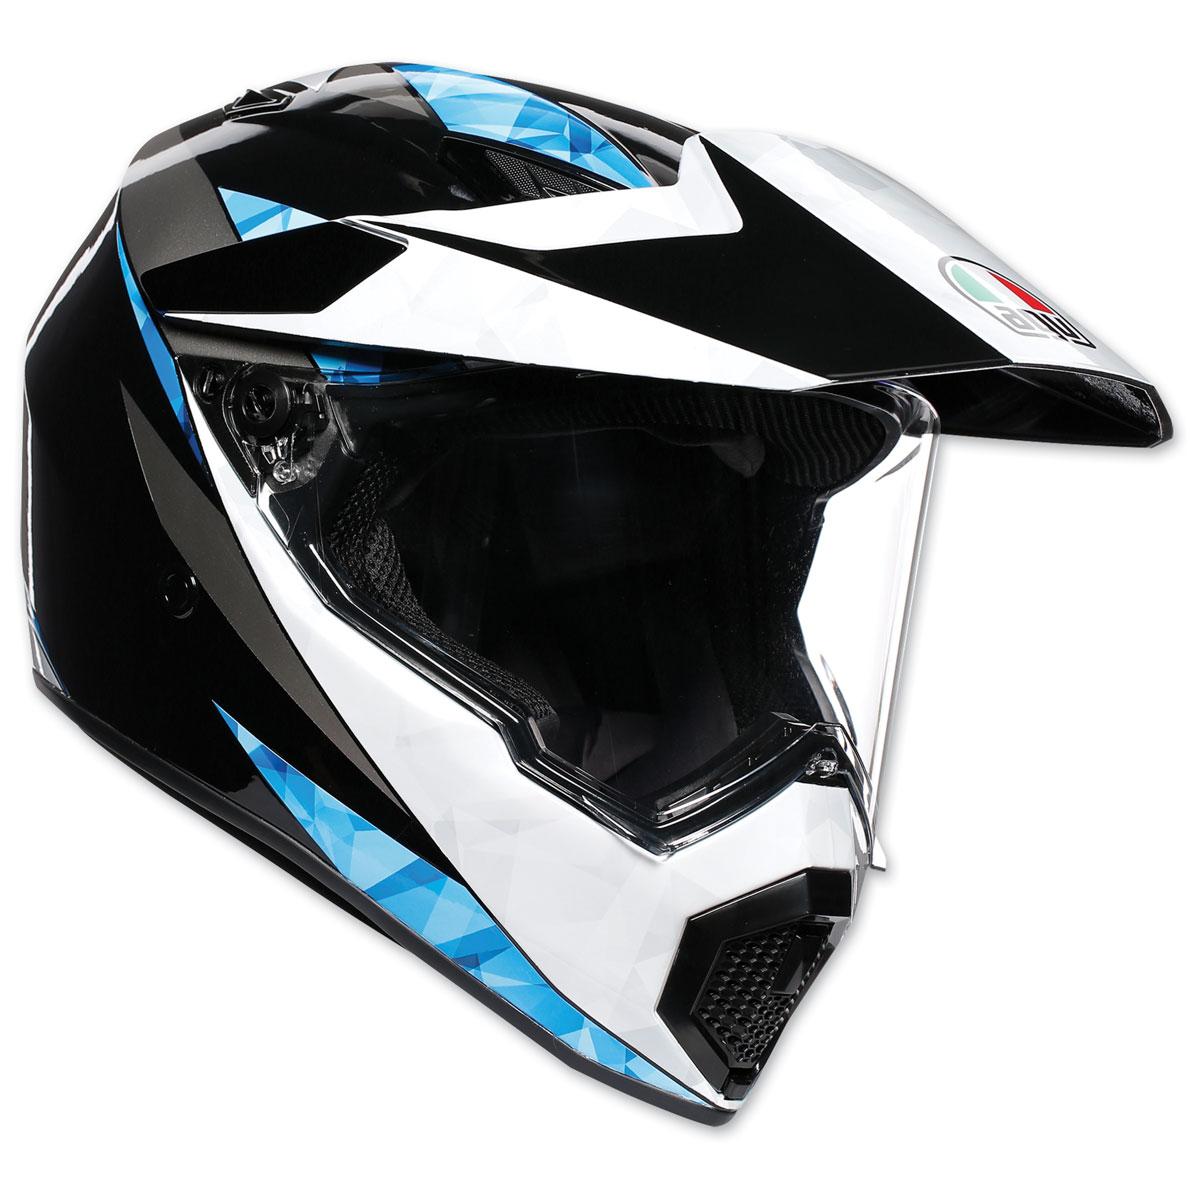 AGV AX-9 North Black/White/Cyan Full Face Helmet